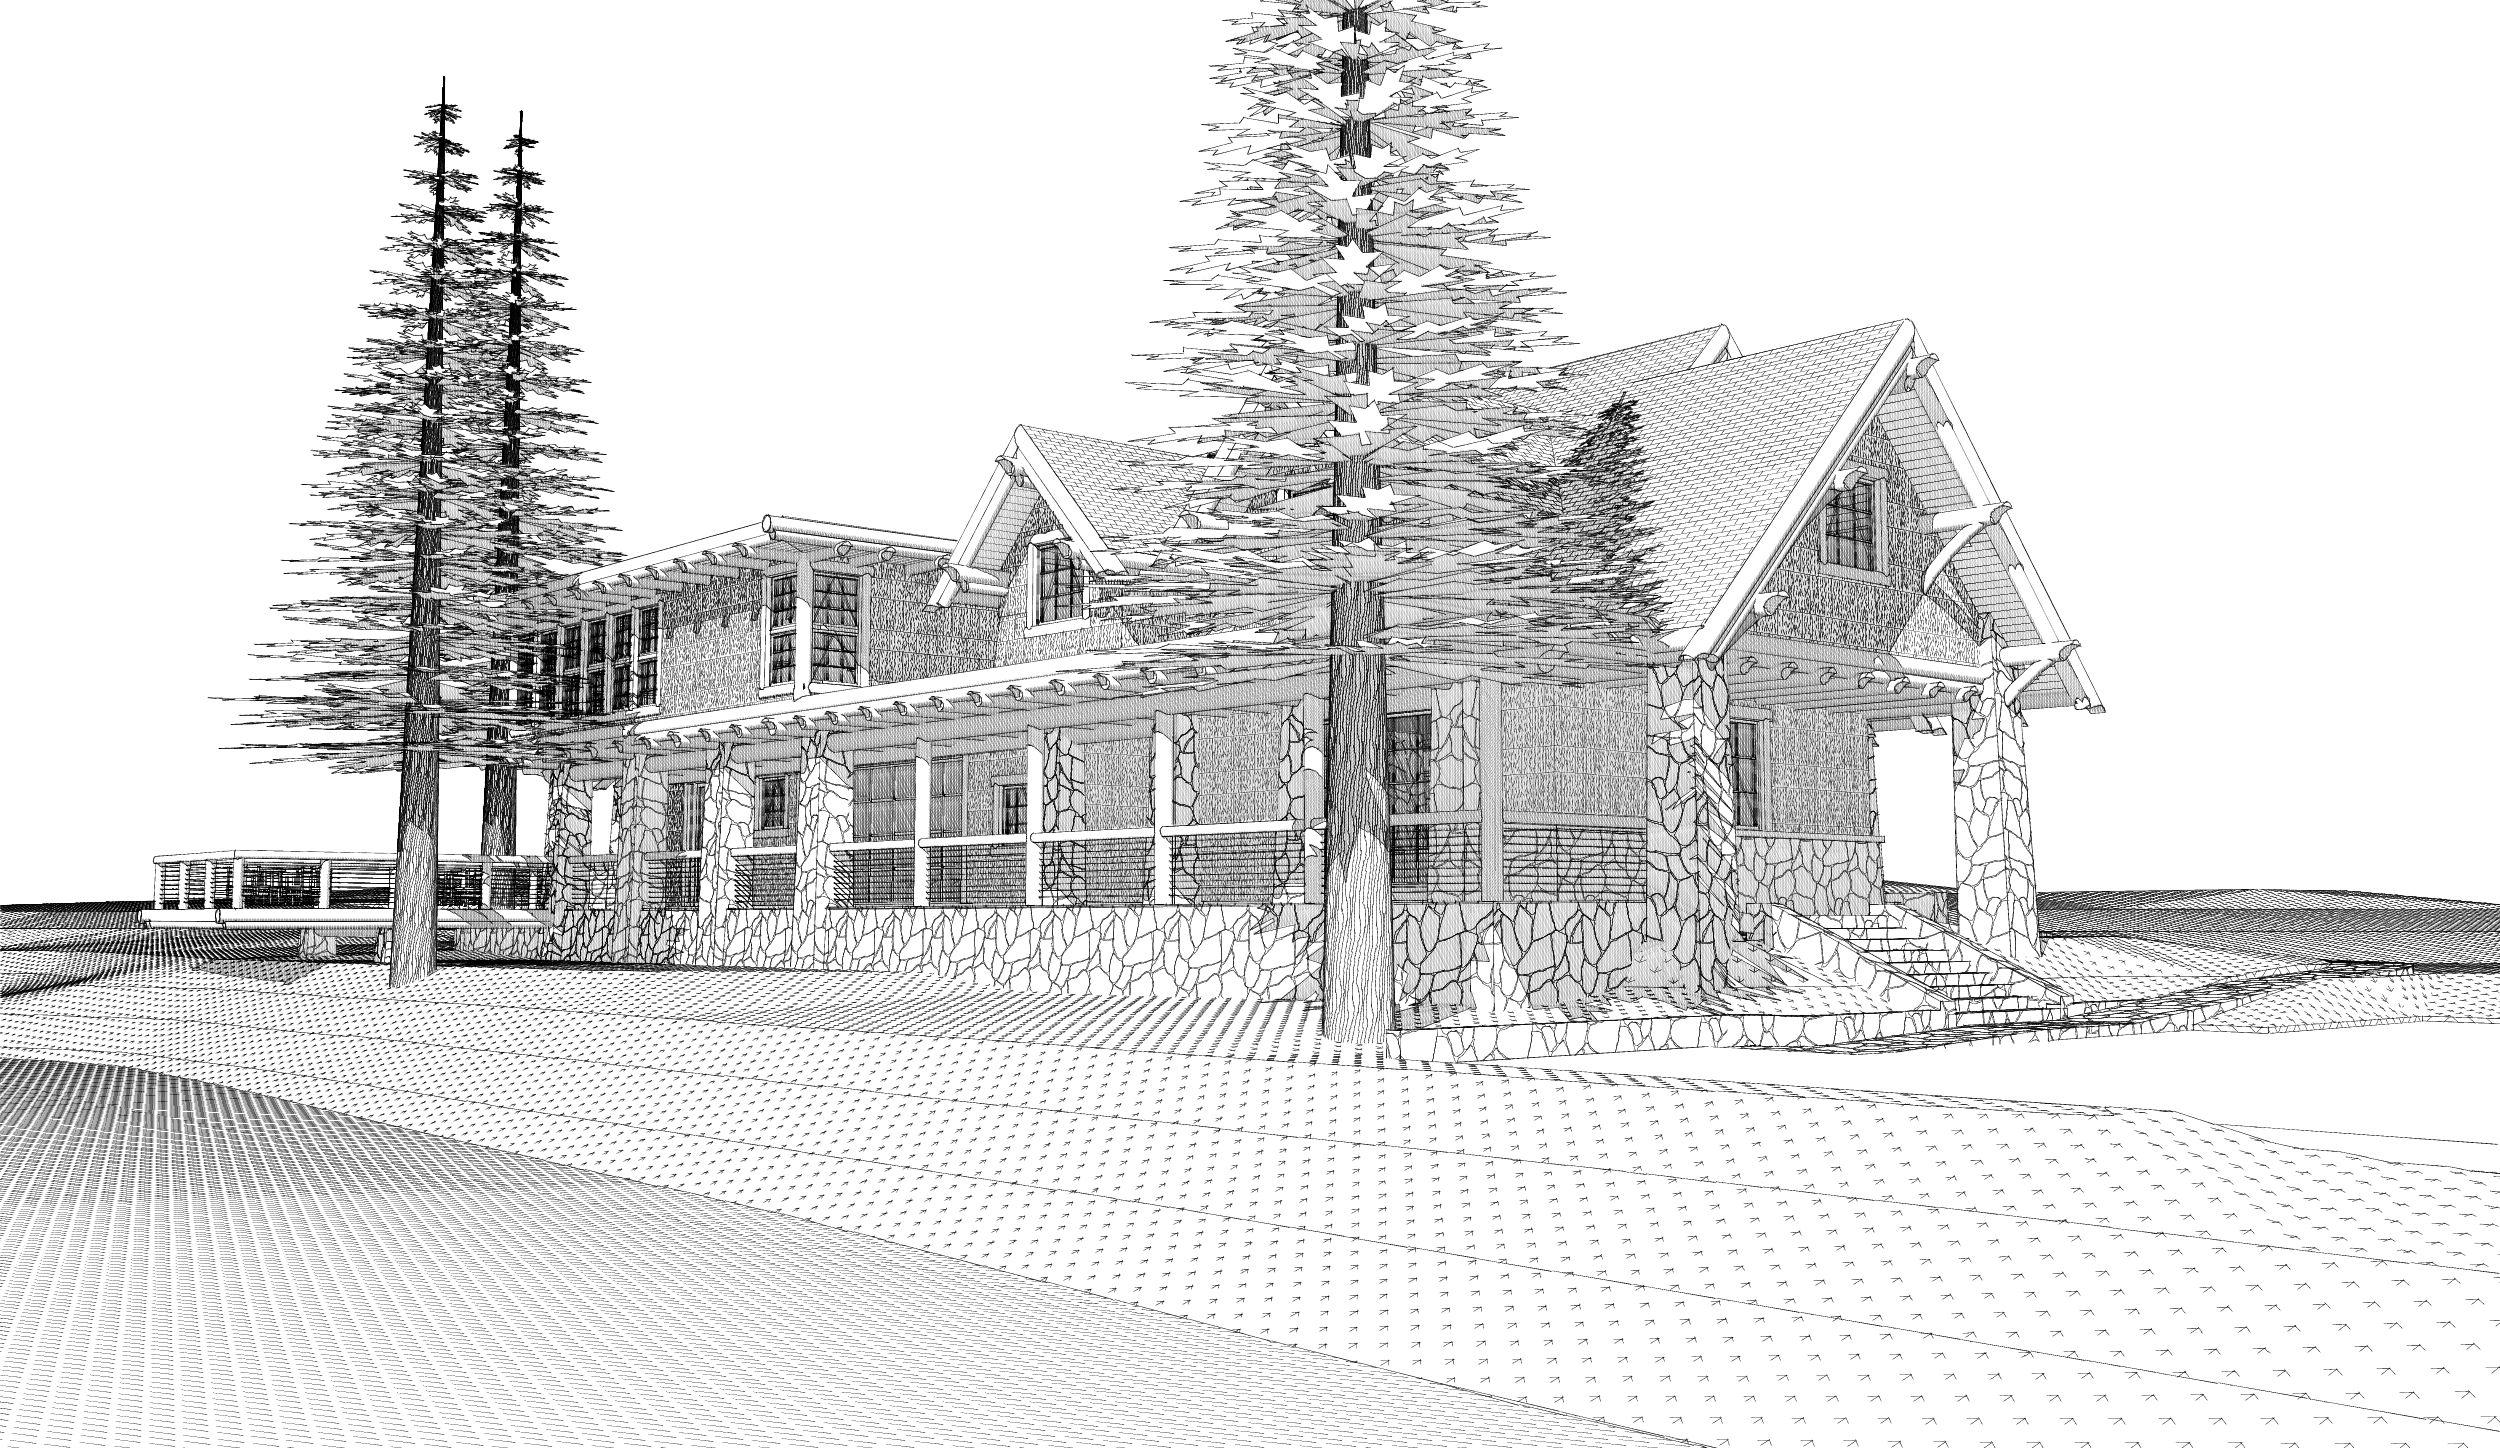 ARCHITECT RUSTIC DESIGN HOUSE NC 04.jpg